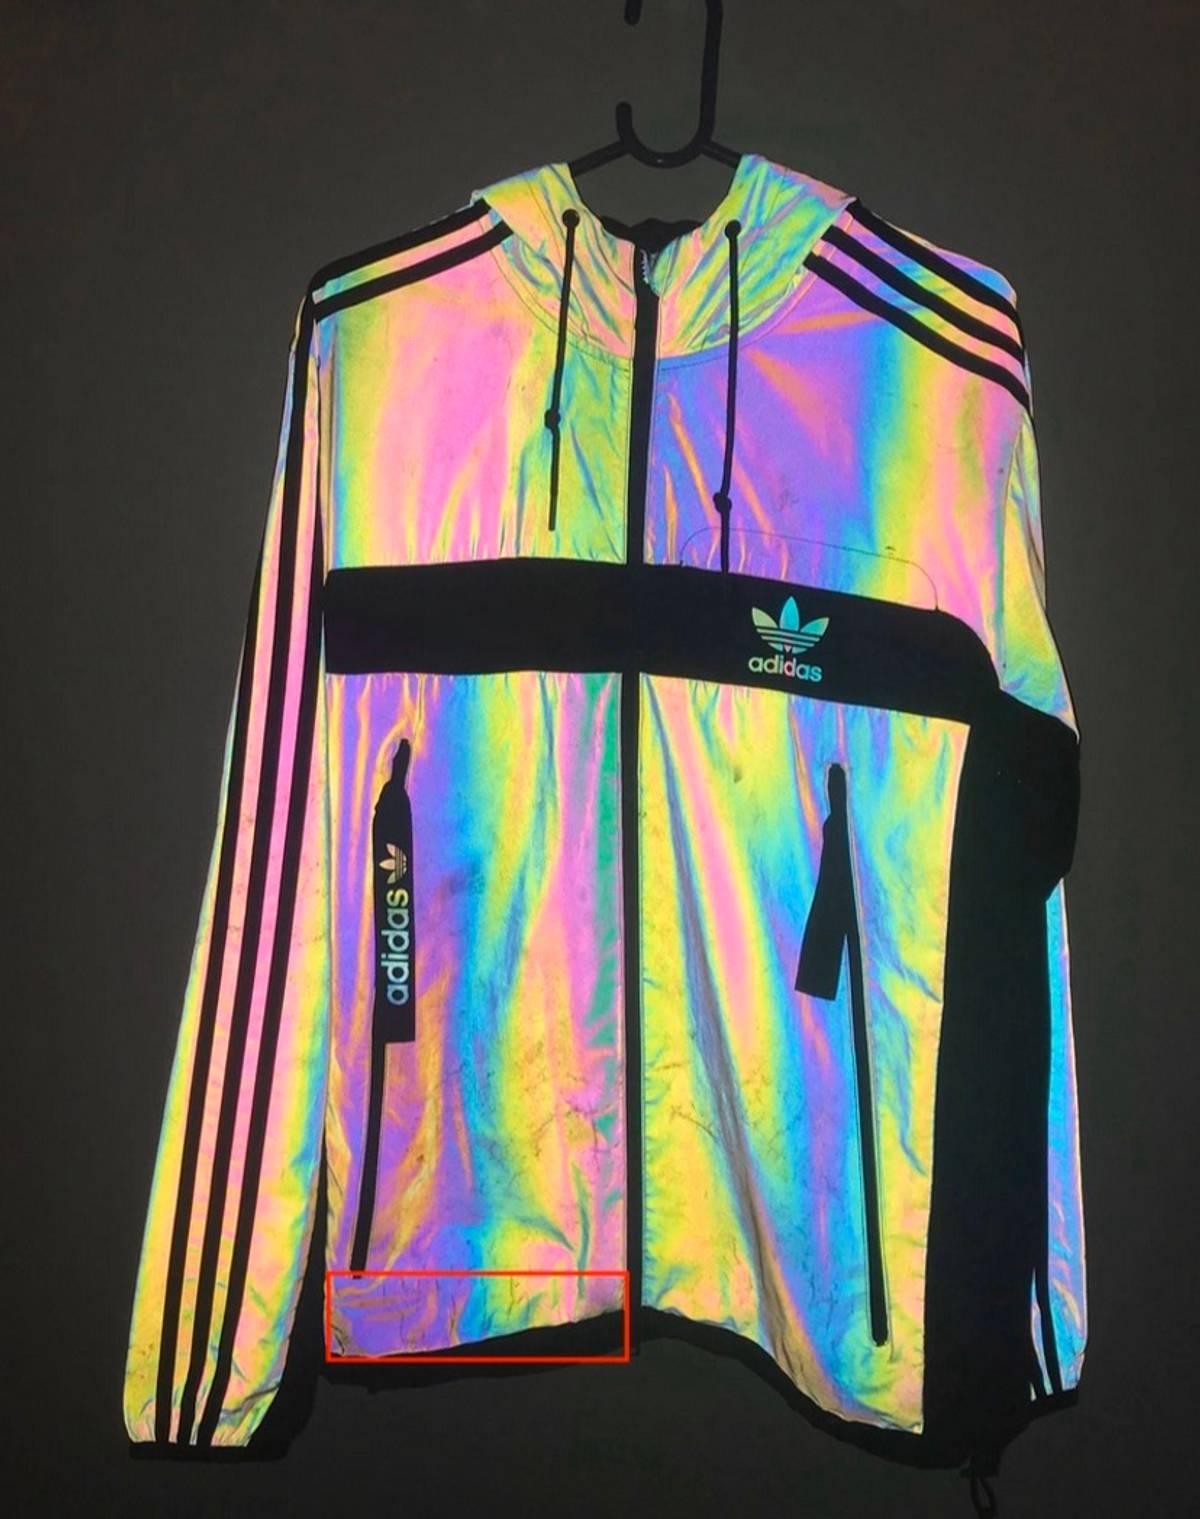 Bebé Interrupción Separación  Adidas Adidas Xeno 3m Reflective Bomber Jacket Coat | Grailed